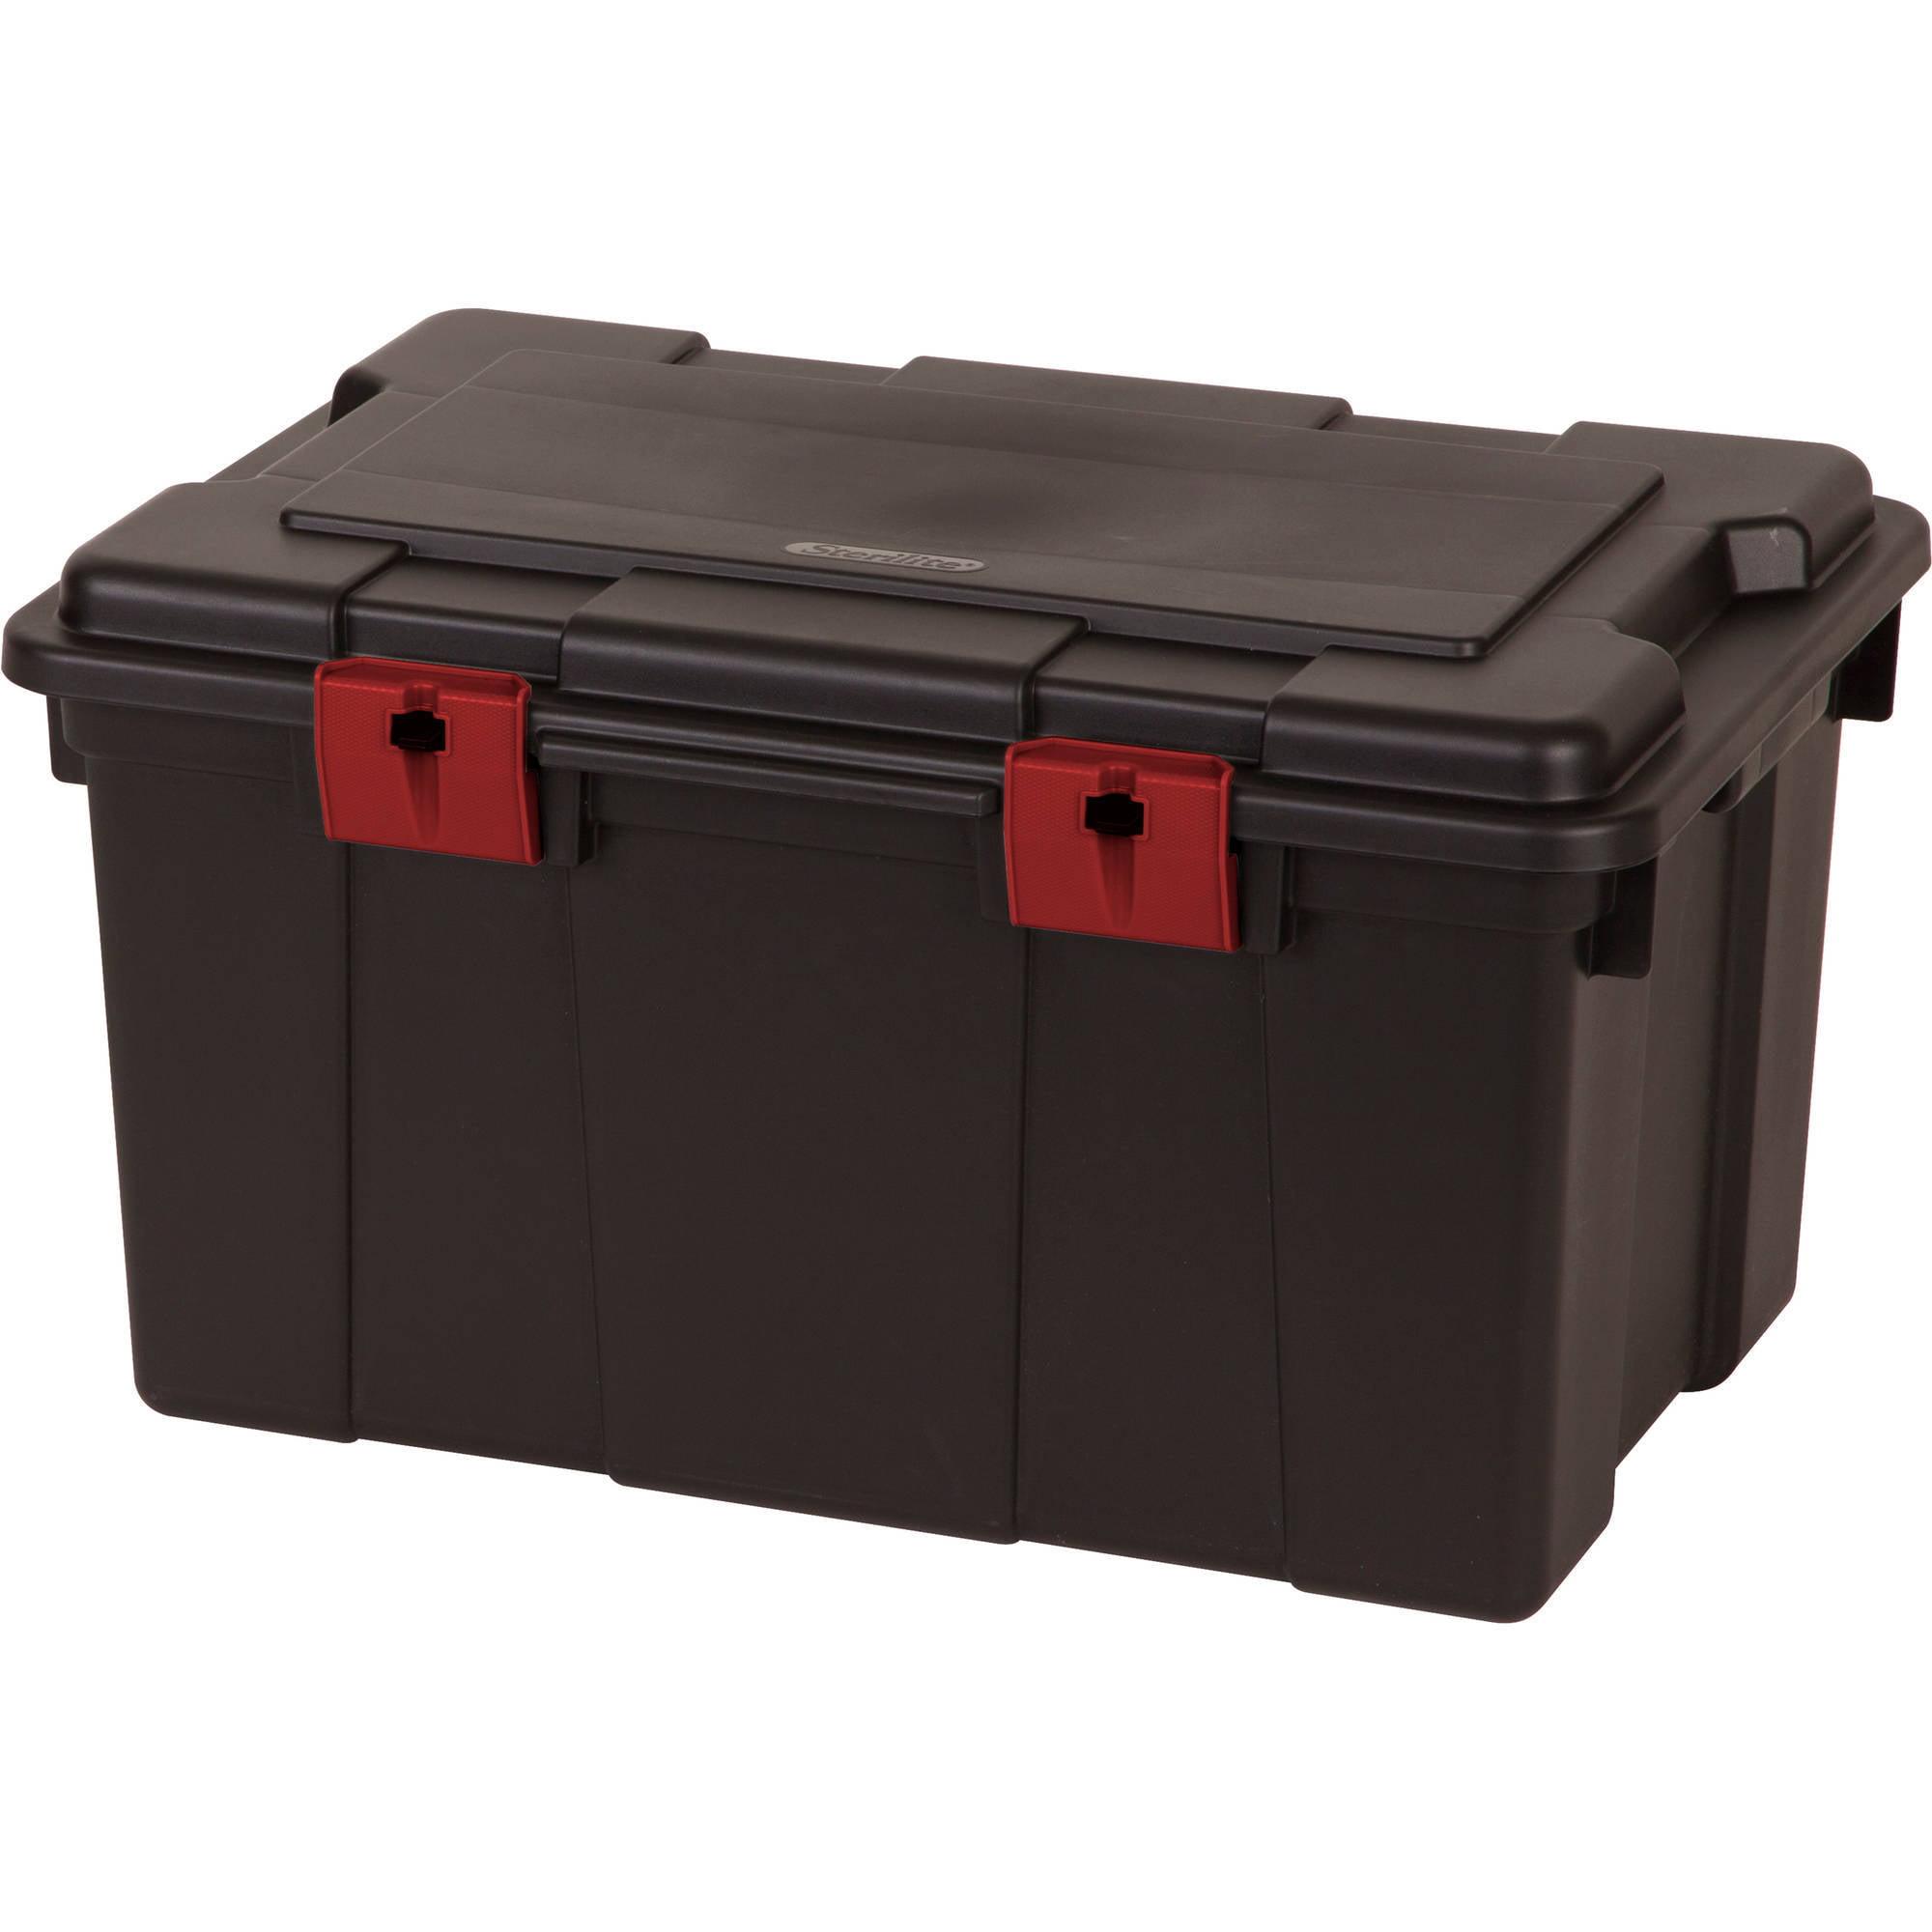 Sterilite 16 Gallon Storage Trunk- Black (Available in Case of 4 or Single Unit)